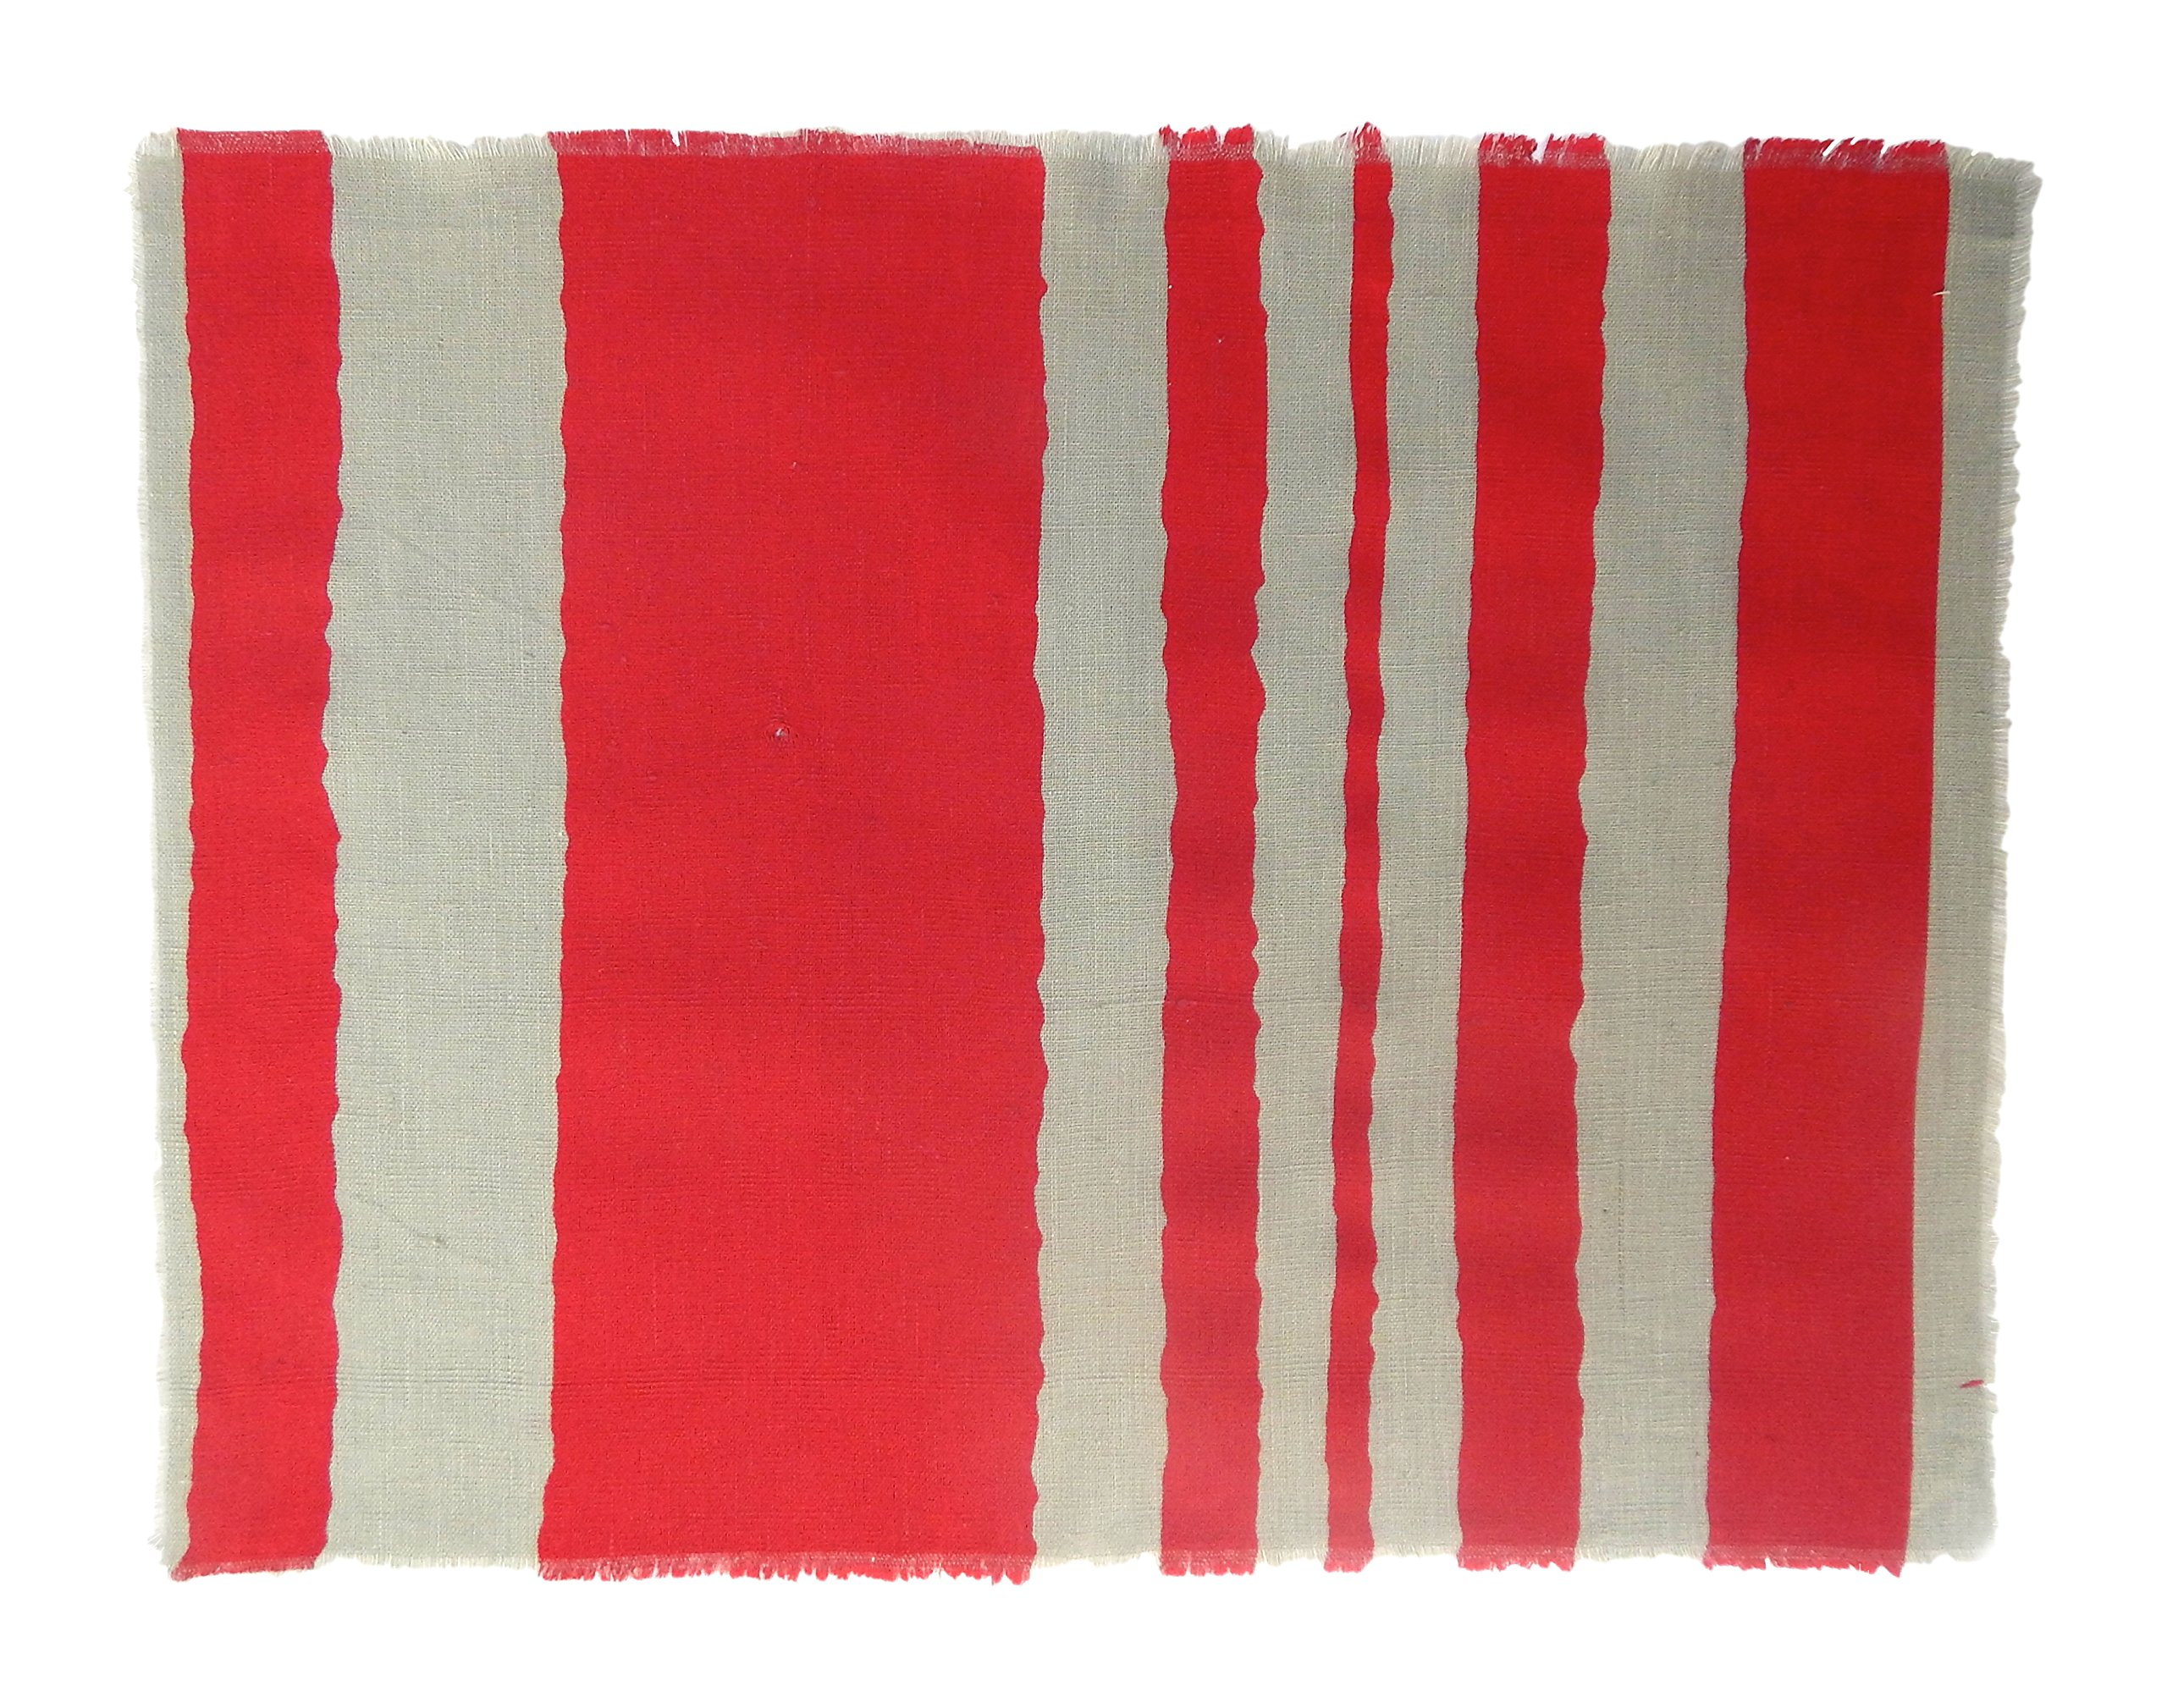 Gitika Goyal Home Windows Collection Cotton Khadi Grey Mat 17x12 Wave Design, Red Hand Screen Print